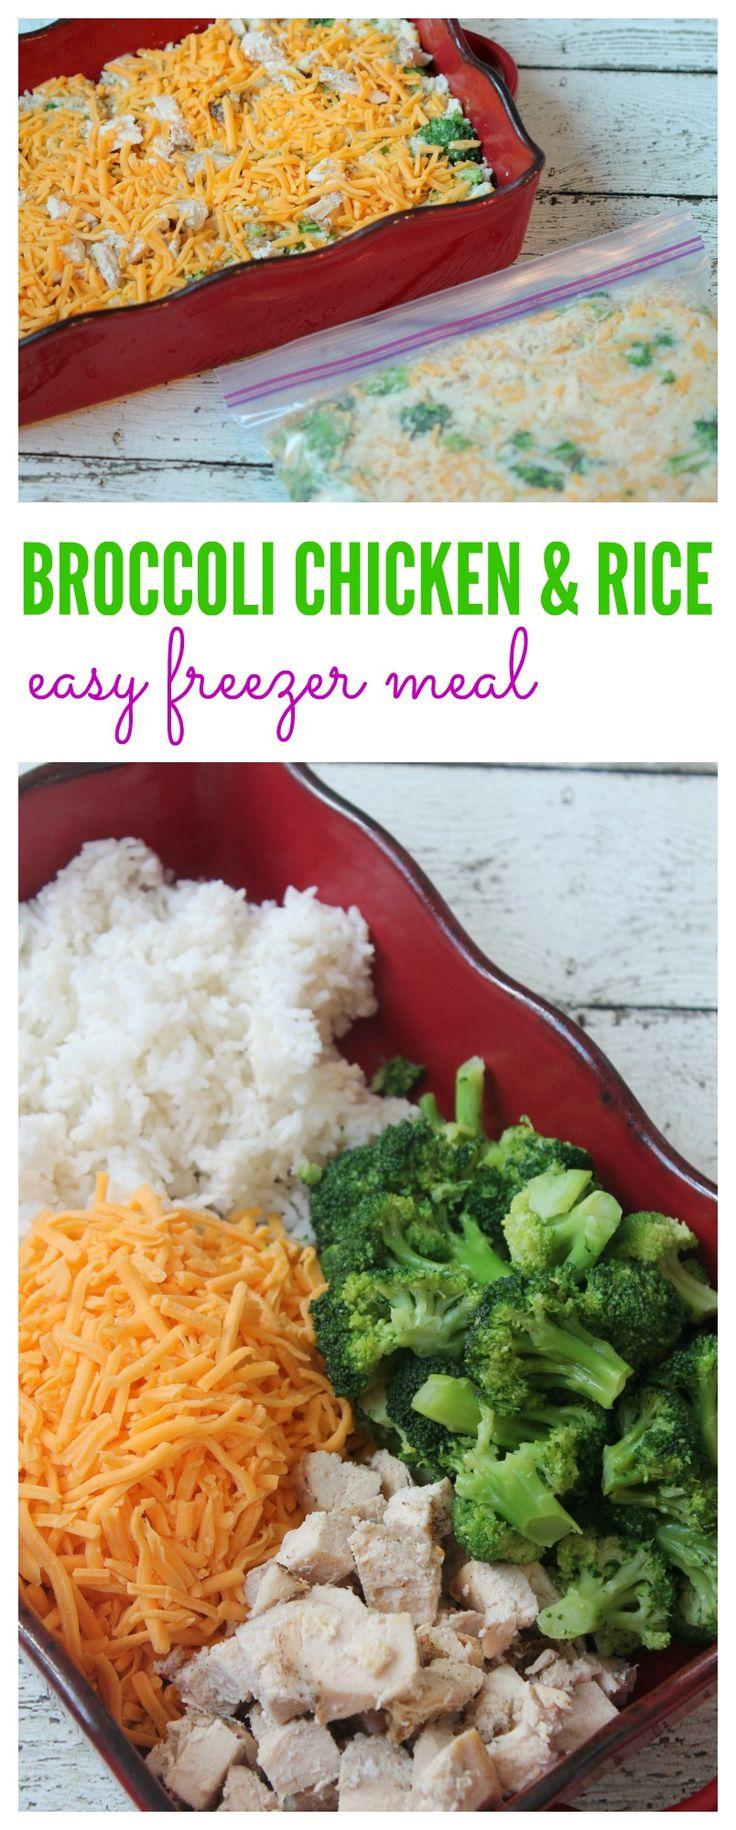 Cheesy Broccoli Chicken & Rice Recipe Freezer Meal!